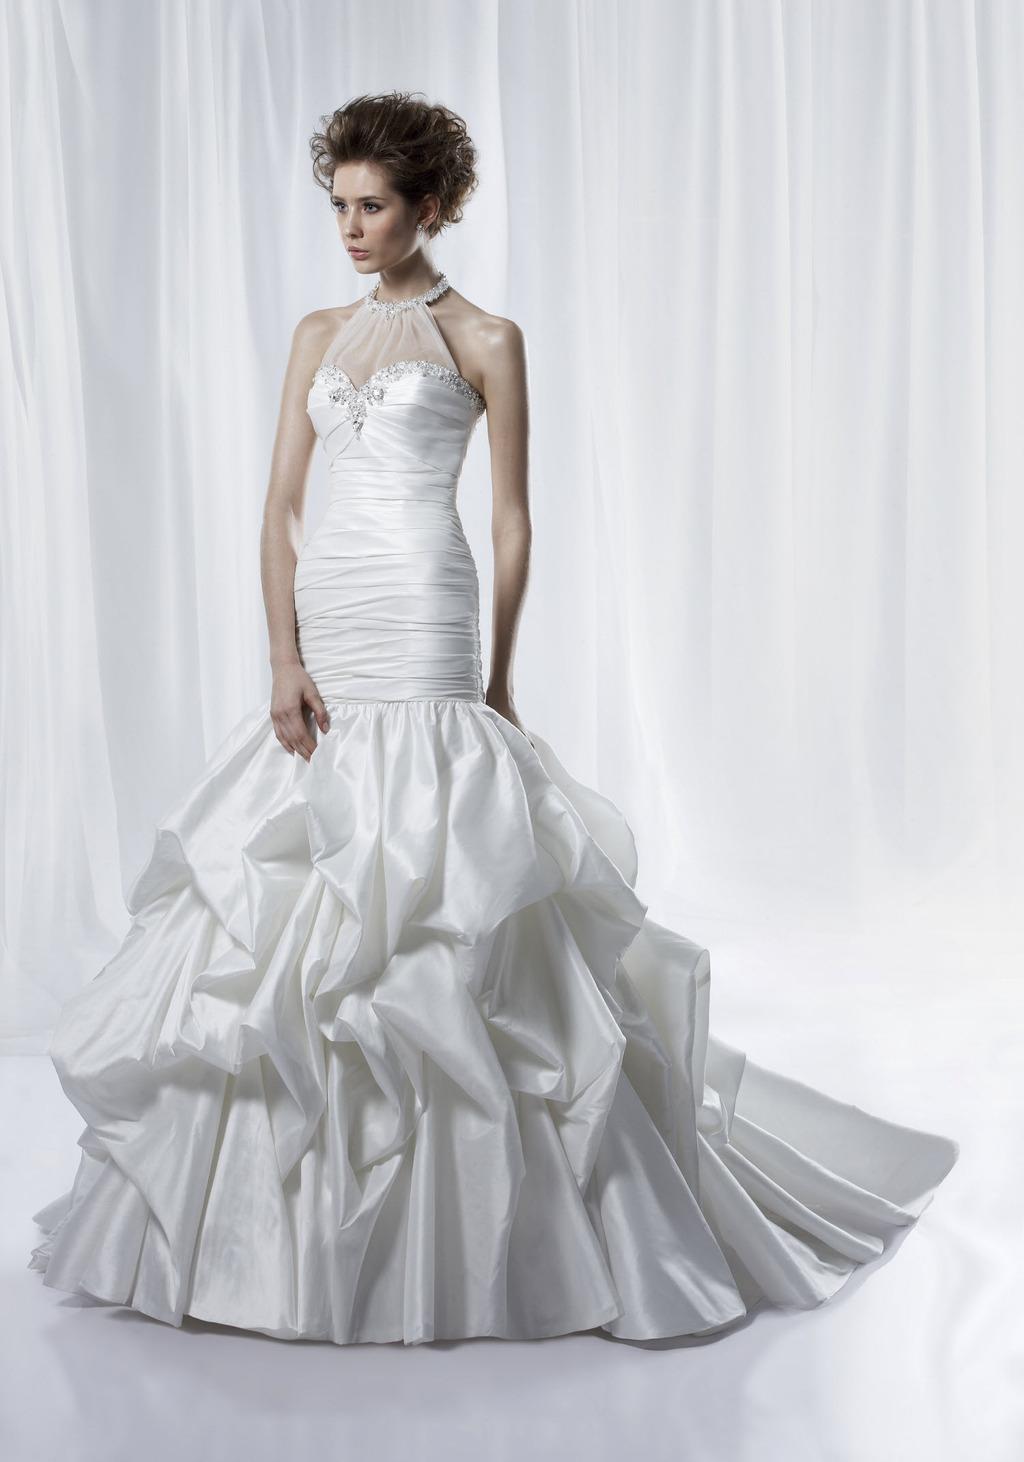 Glamourous-wedding-dresses-a213a-halter-bridal-gown-bustle-ballgown-skirt.full